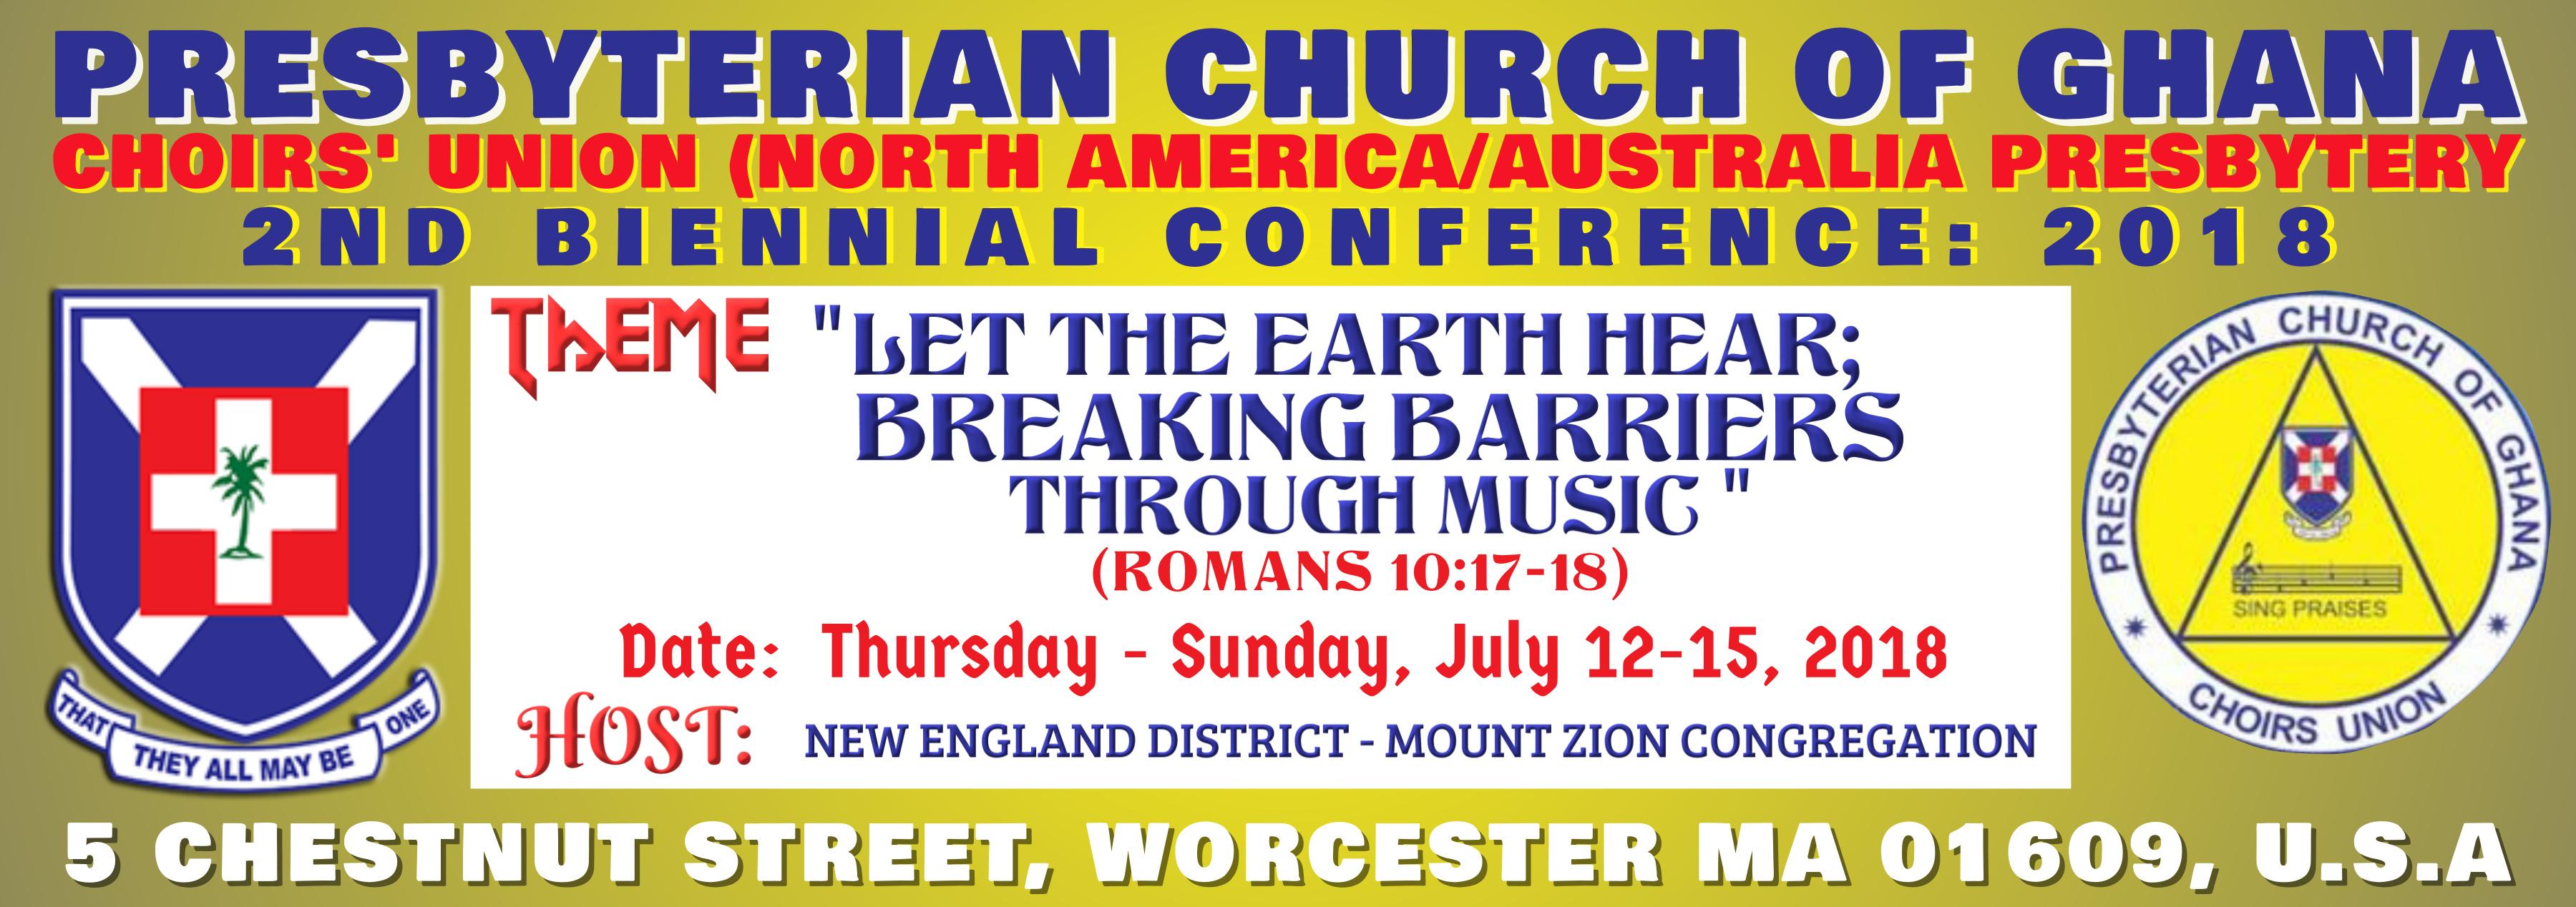 Church Choir's Union 2nd Biennial Conference 2018 - North America & Australia Presbytery